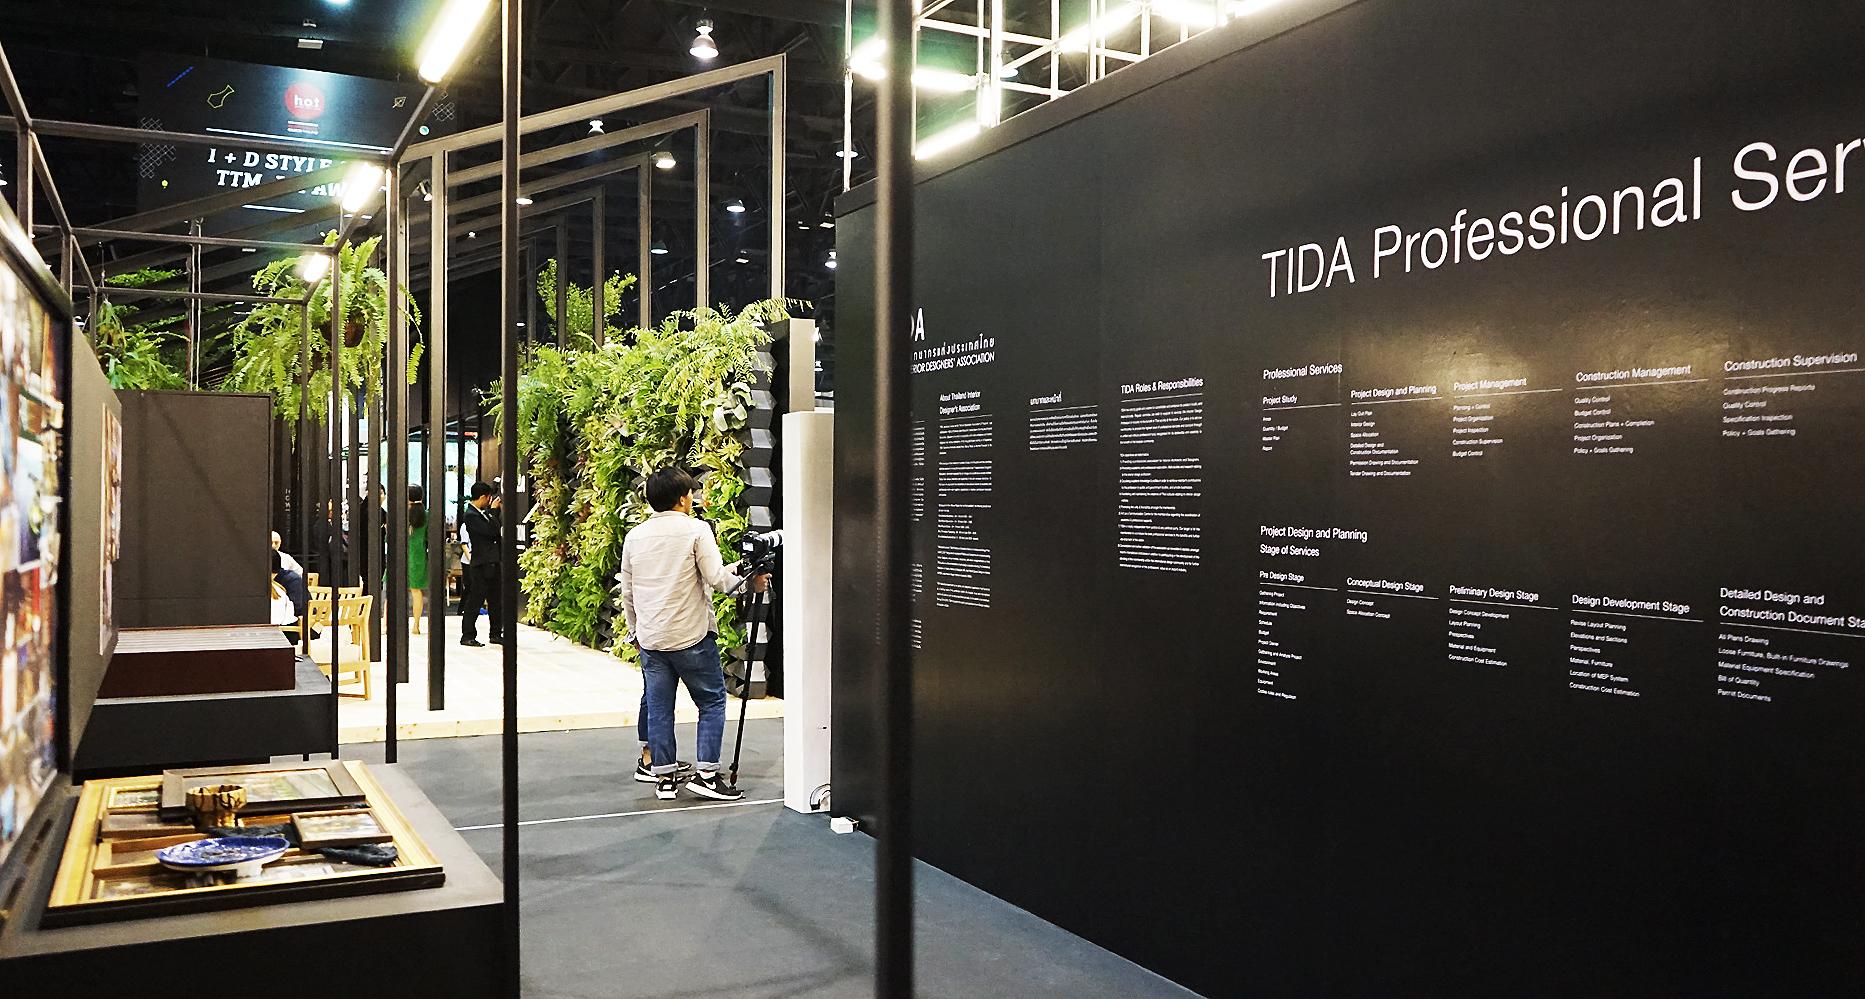 tbt-daf_tida 2015_exhibition 5